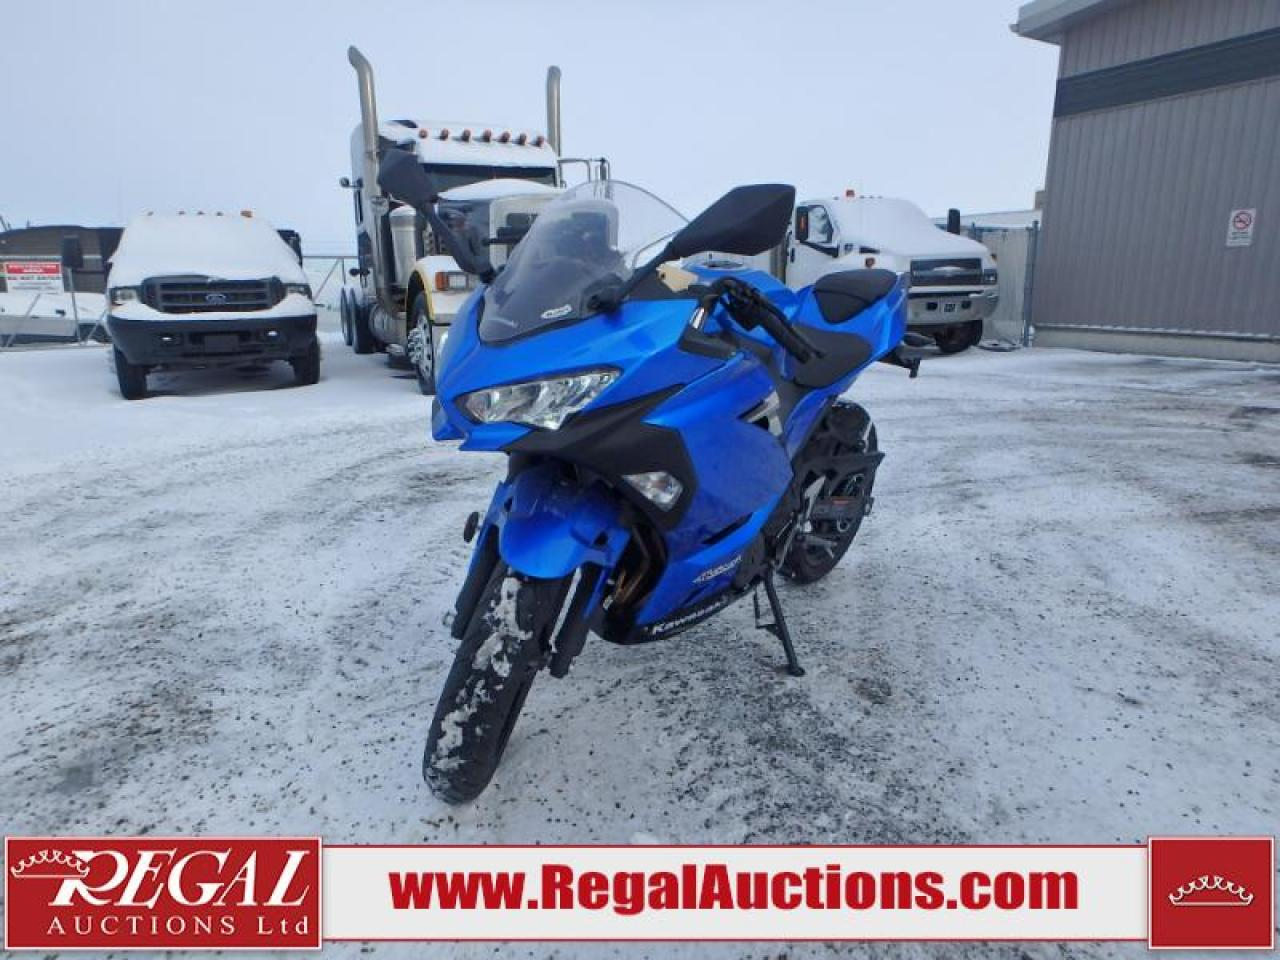 Photo of Blue 2018 Kawasaki Ninja 400